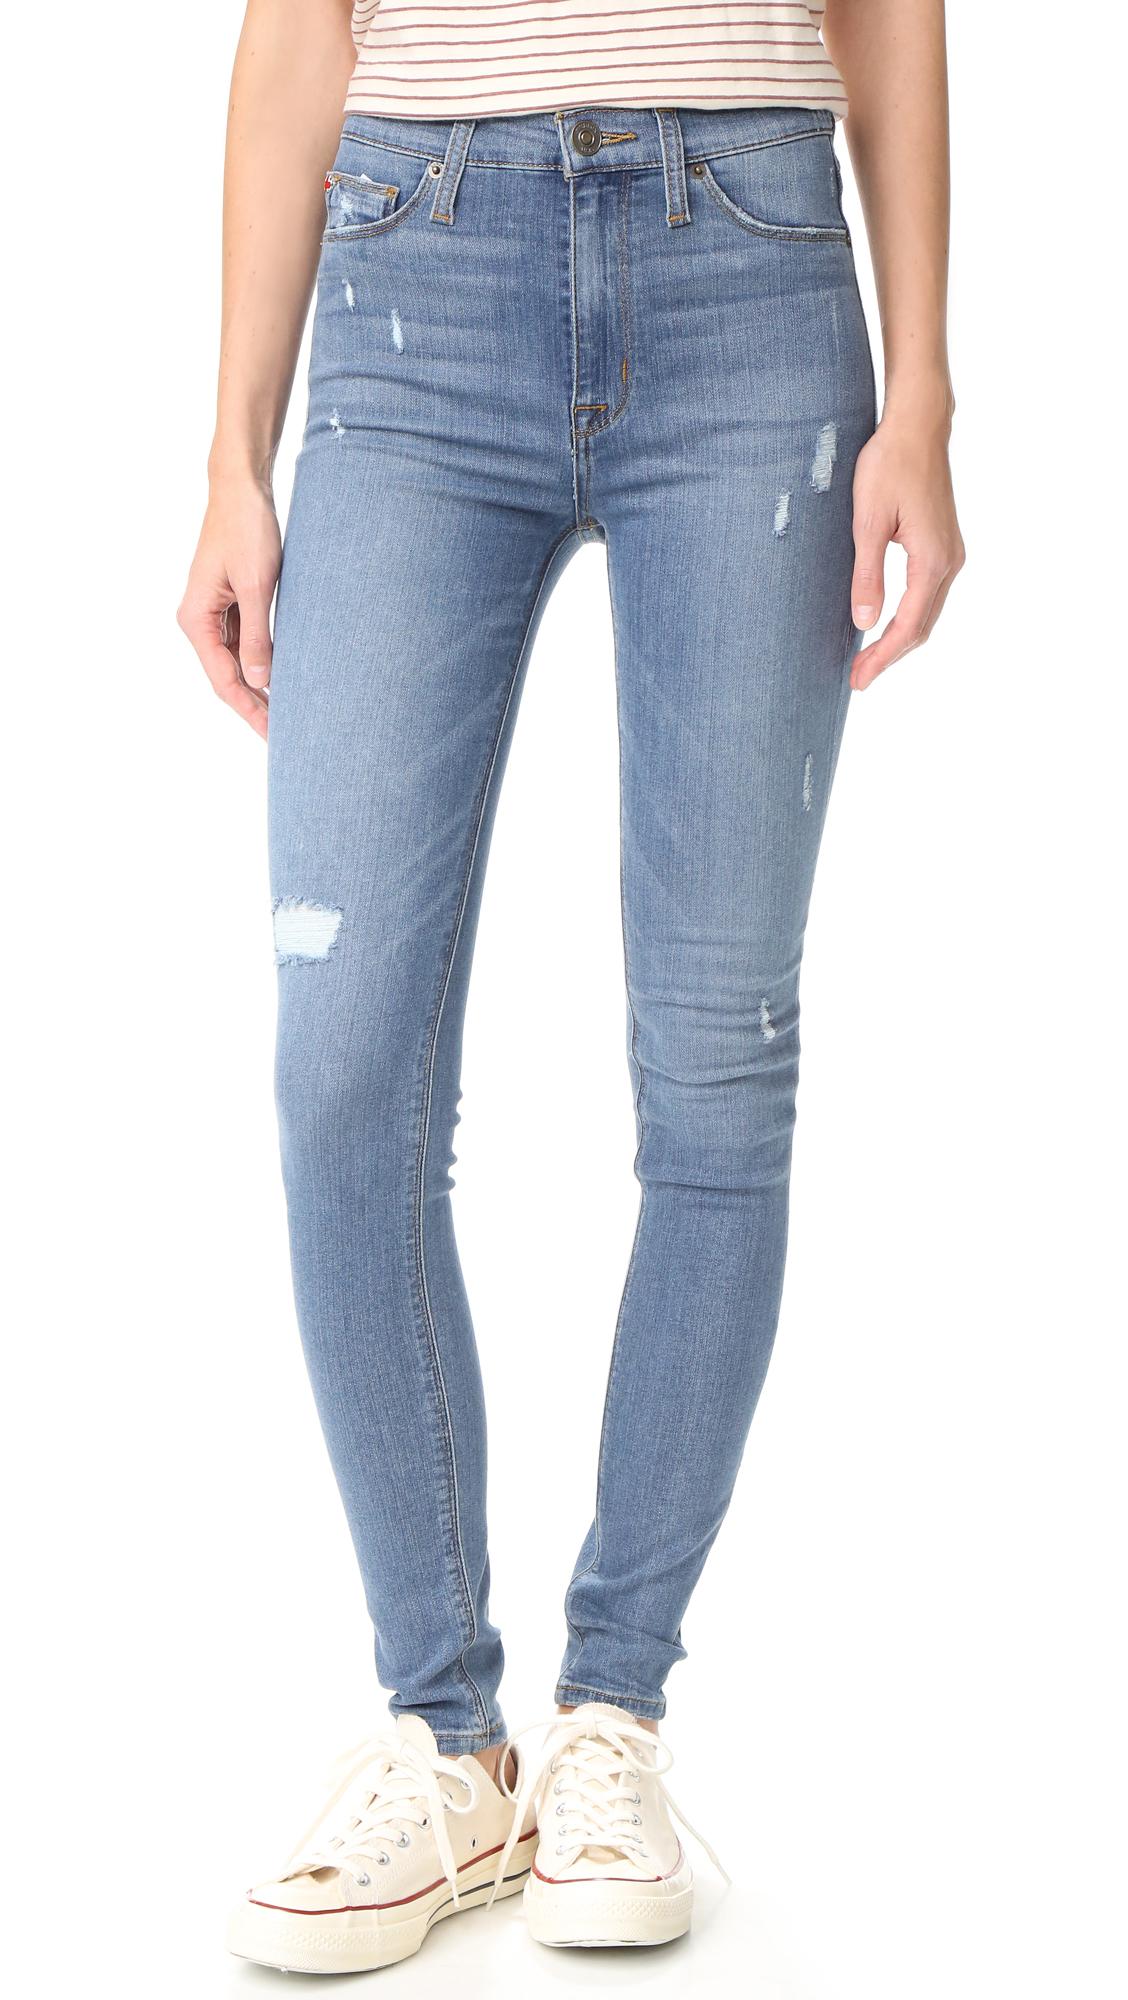 Hudson Barbara High Waisted Skinny Jeans - Revolver at Shopbop